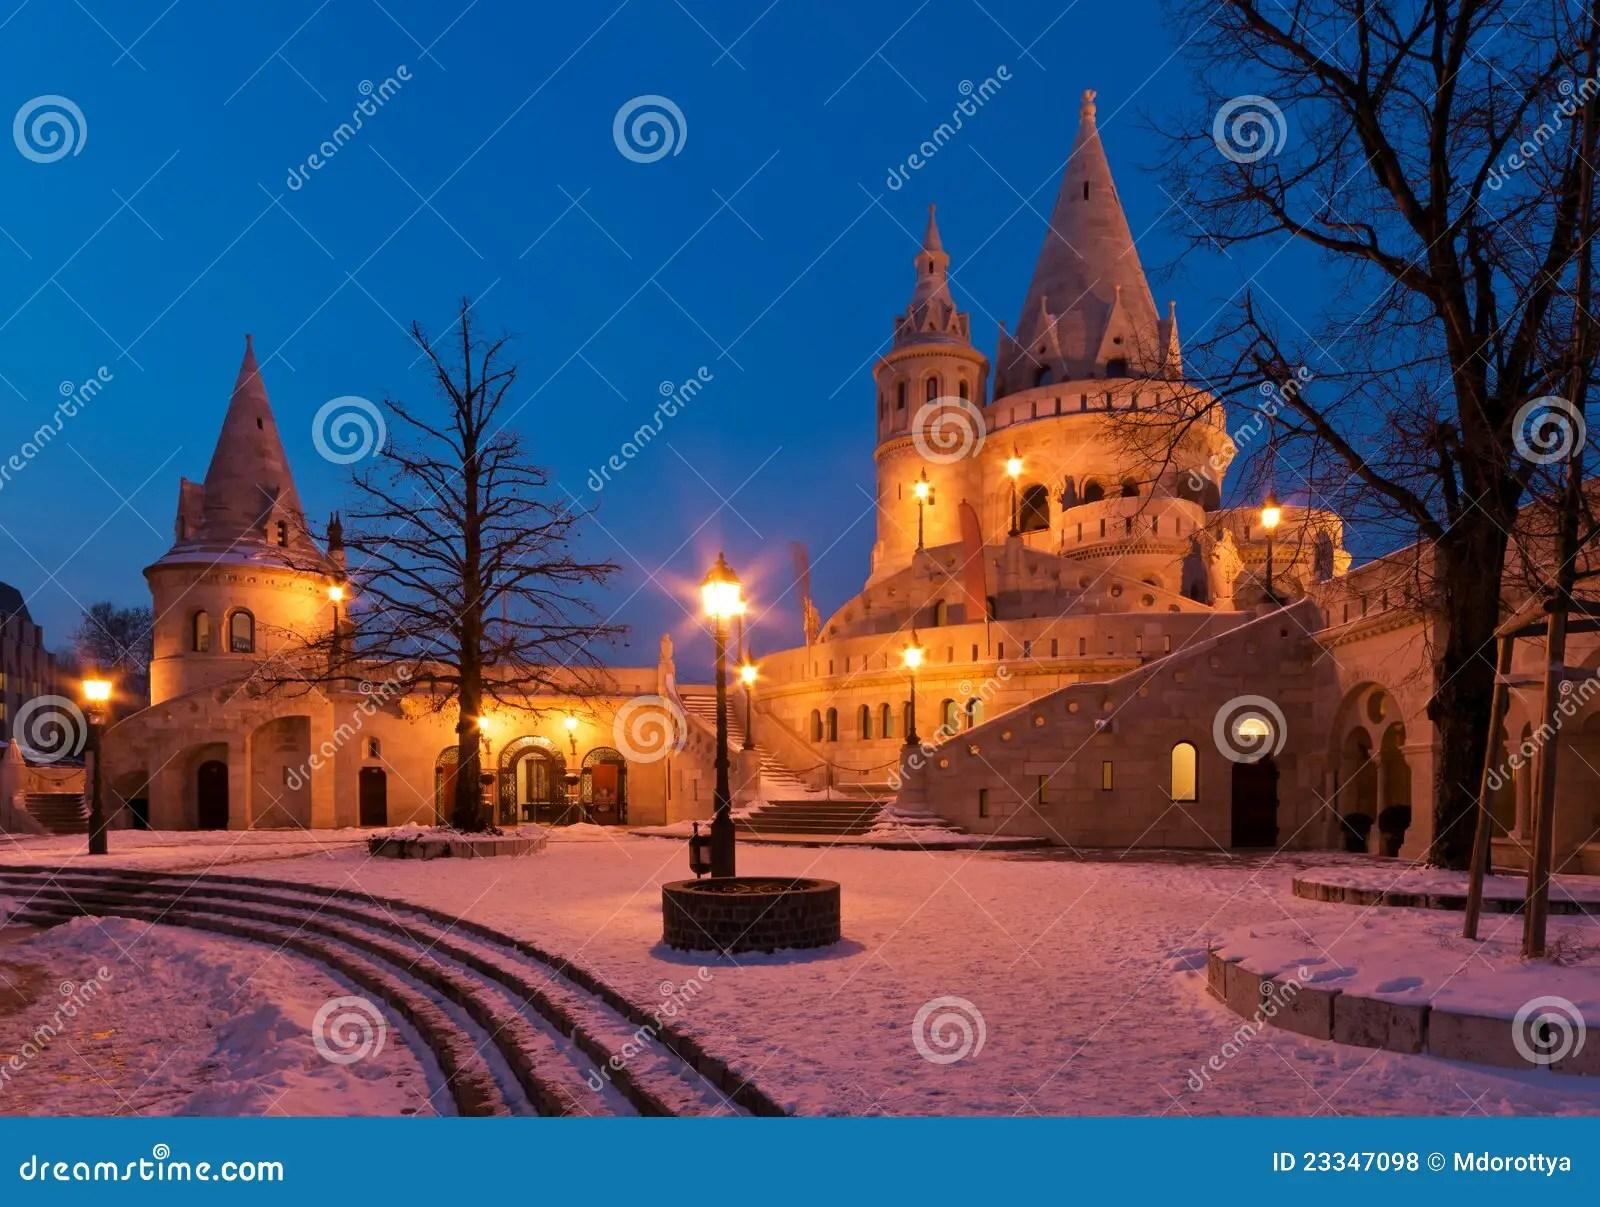 Winter Scene Of The Fishermans Bastion Budapest Royalty